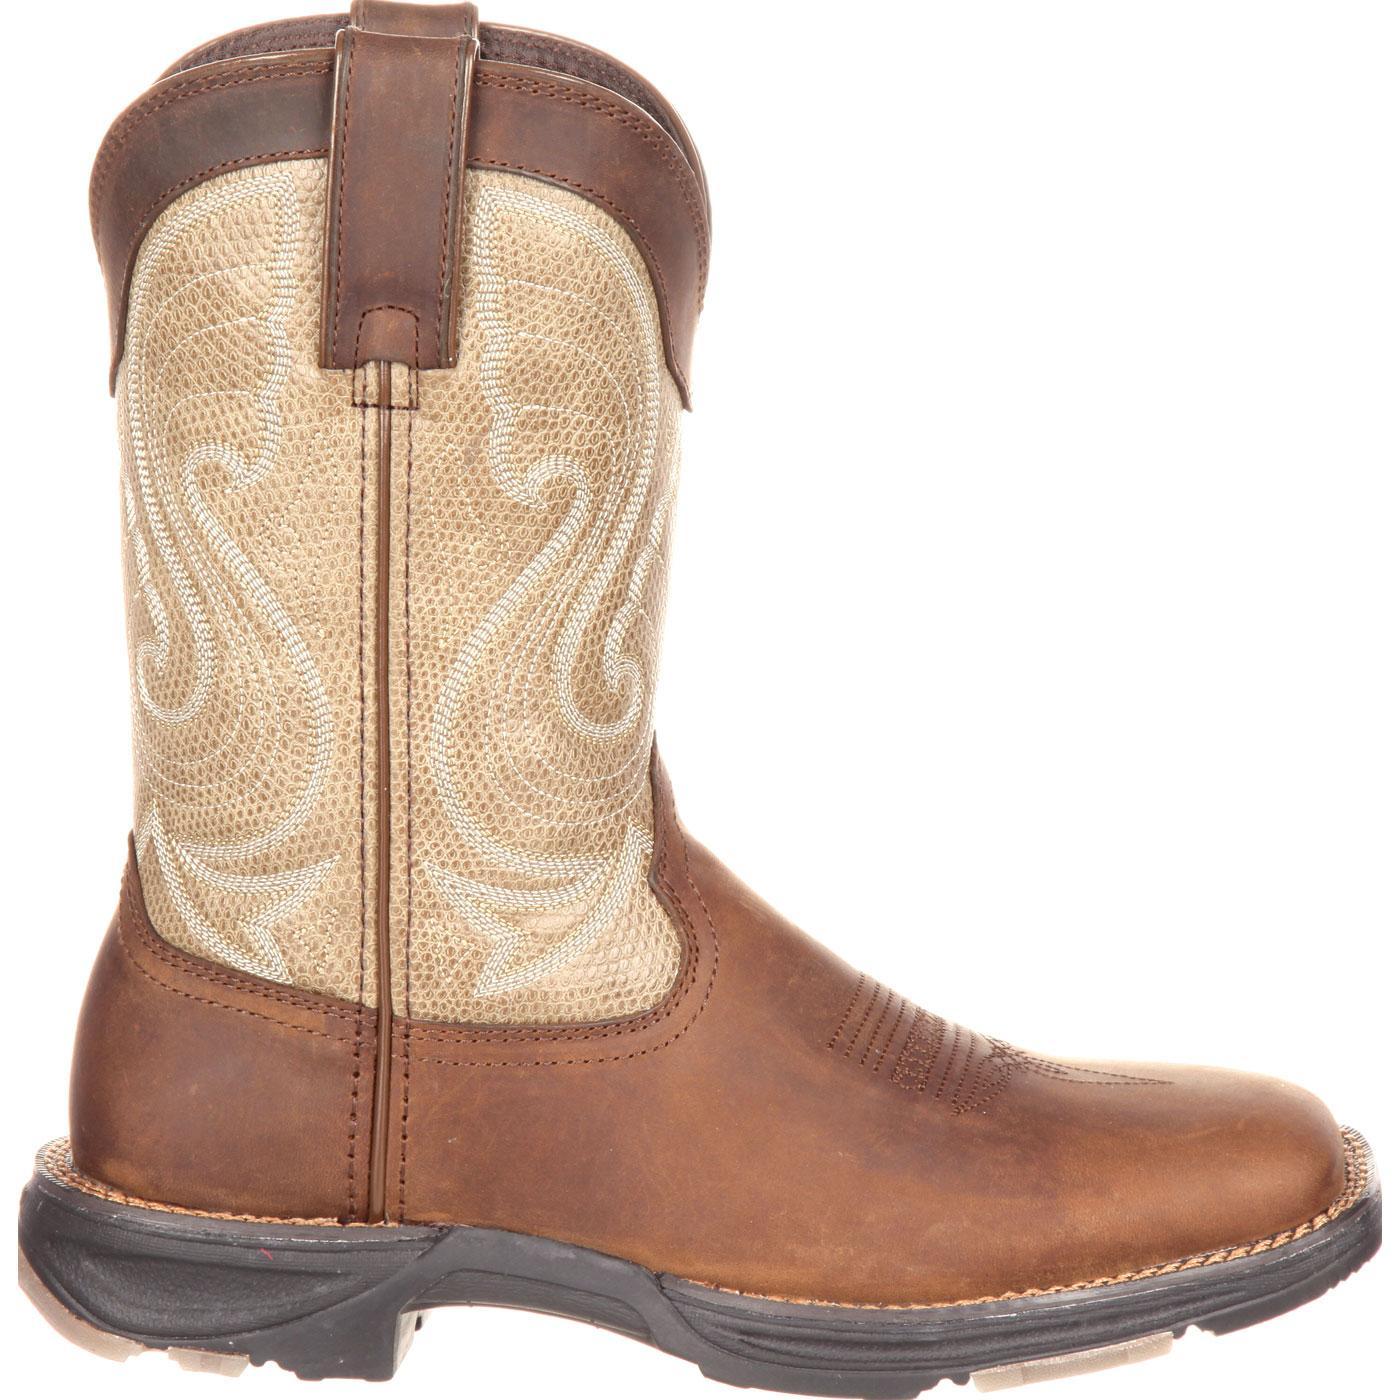 d5babfd4e DRD0182, Durango UltraLite Women's Western Boot